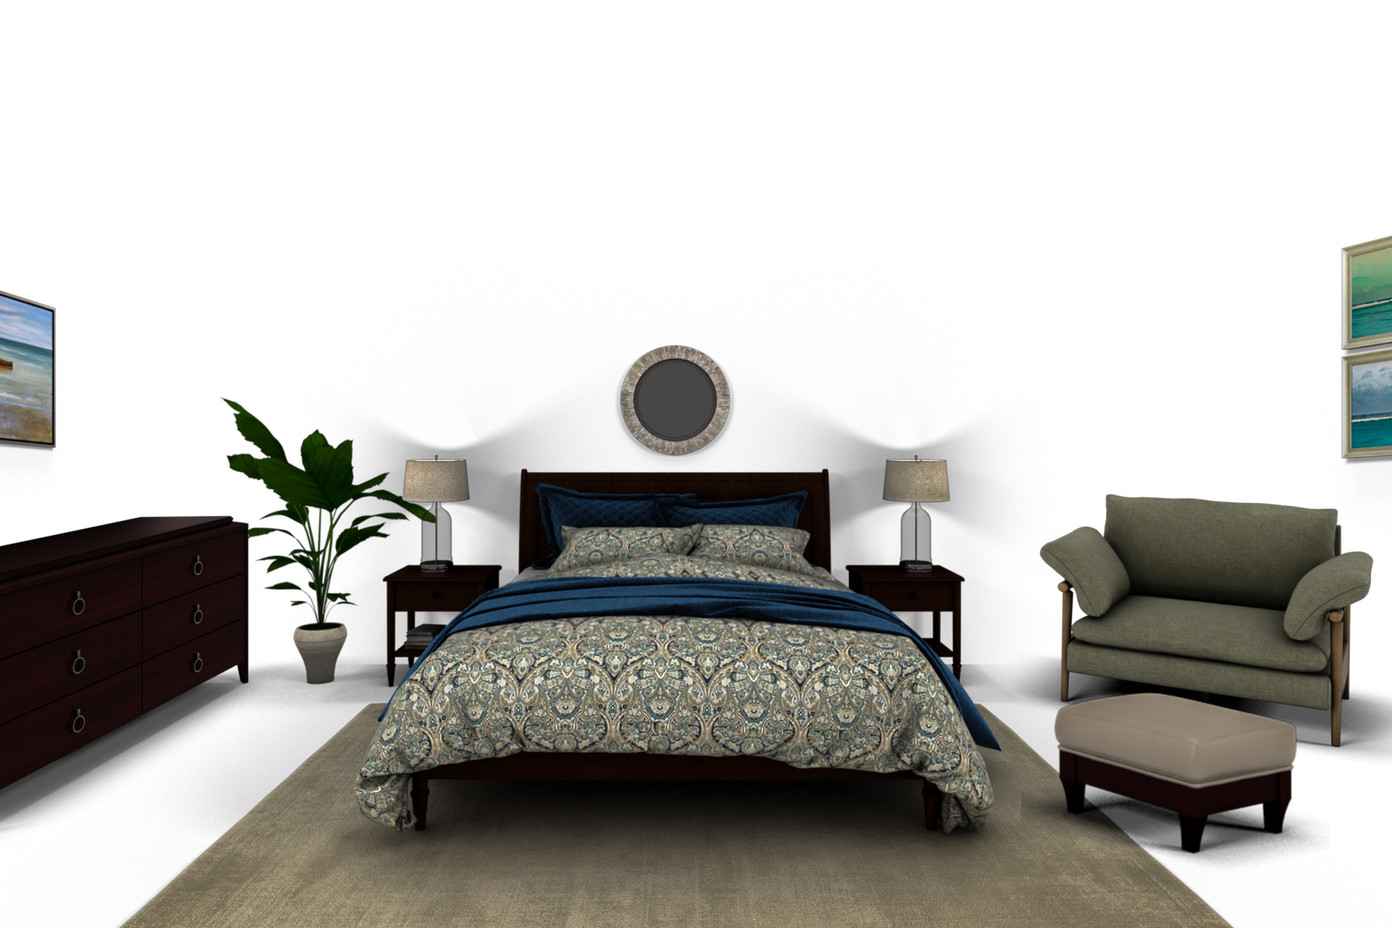 Bedroom Coastal 7.jpg